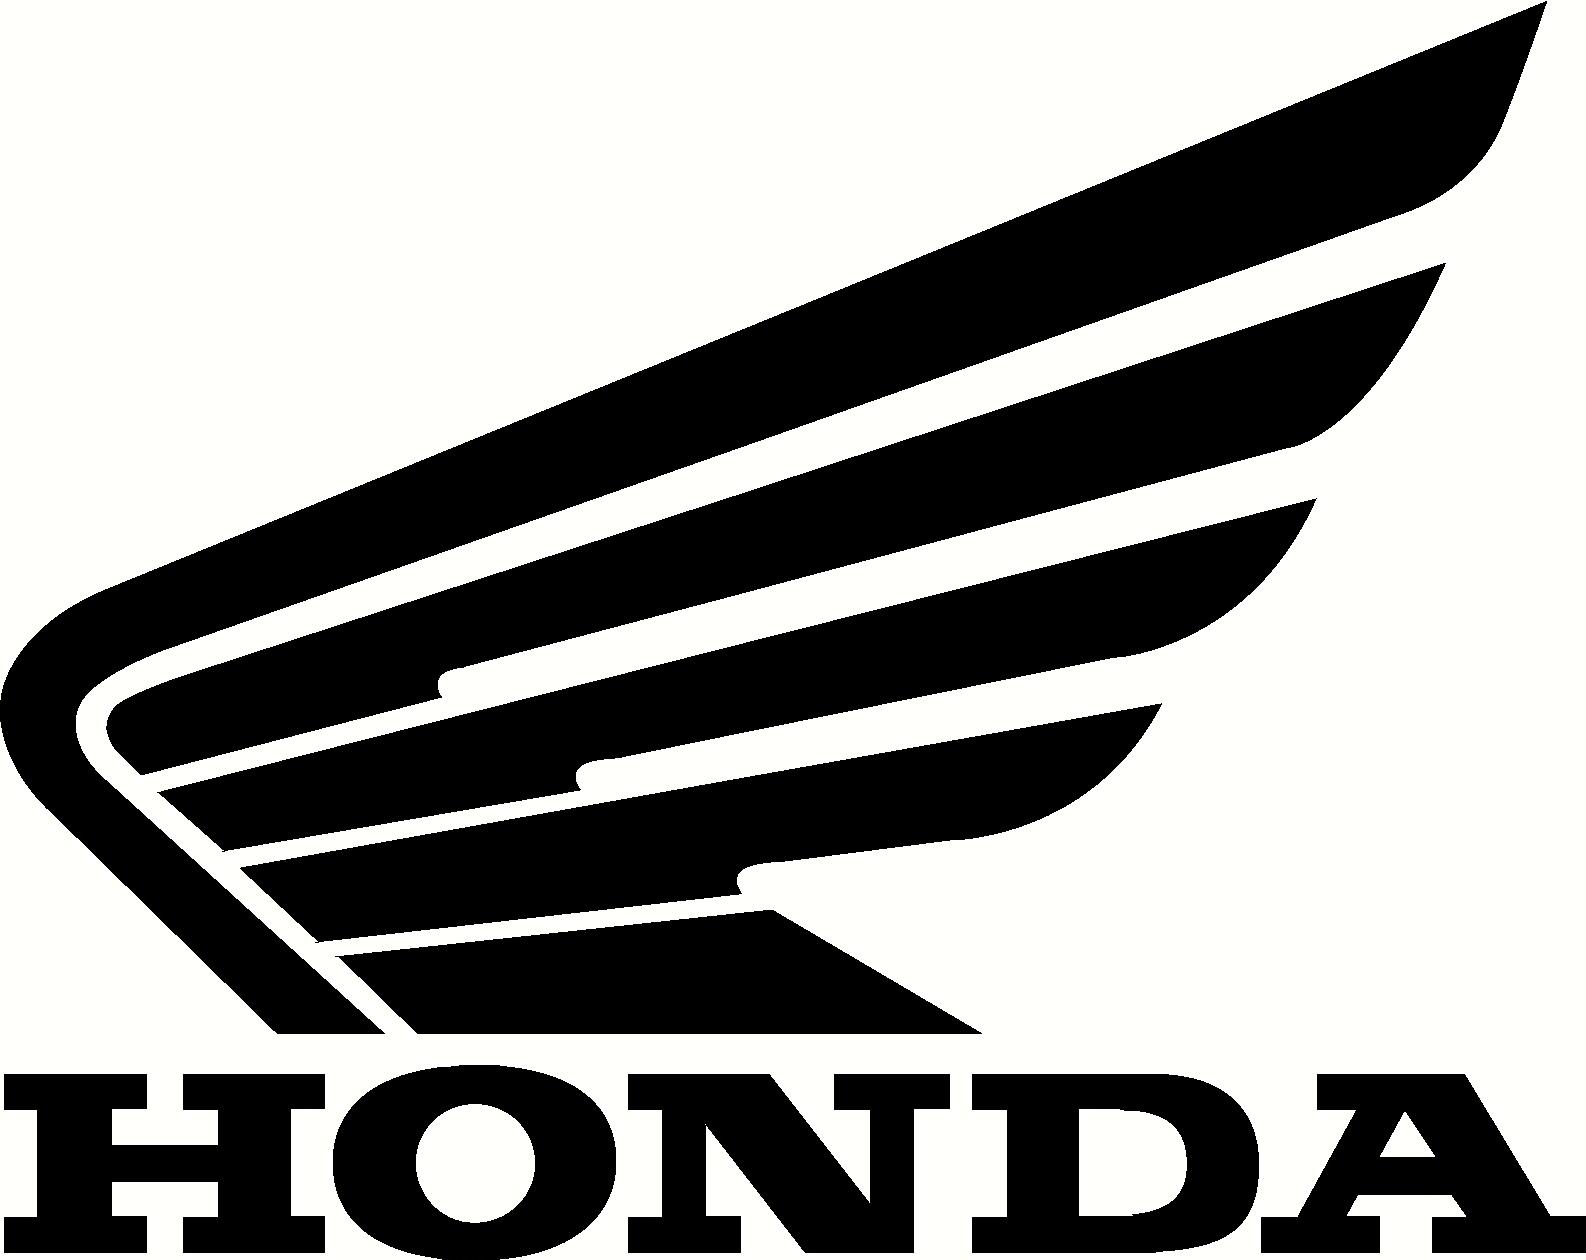 Honda logo vector clipart graphic stock Free Honda Logo Cliparts, Download Free Clip Art, Free Clip Art on ... graphic stock